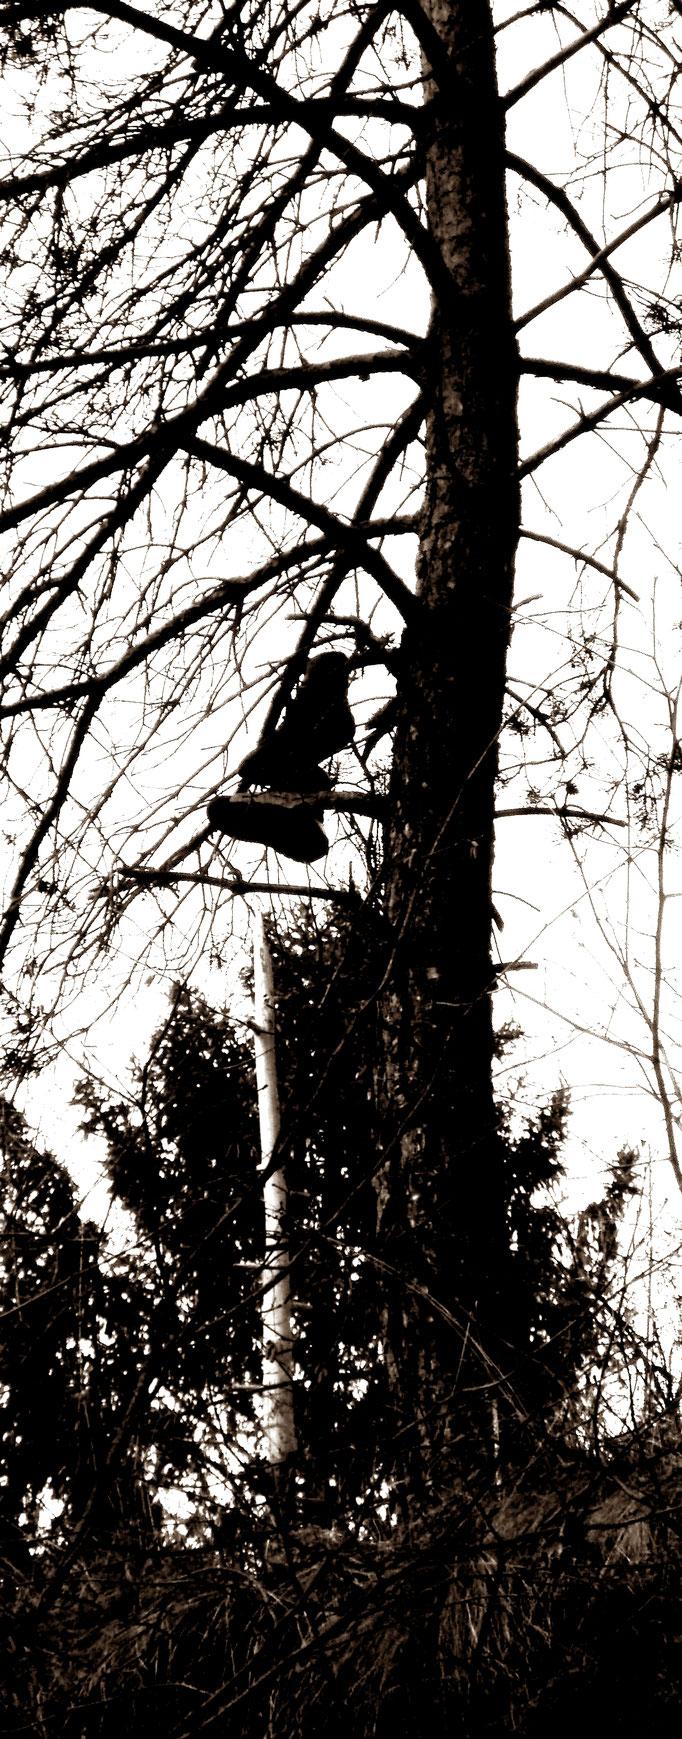 Schuhe Olang im Baum - scarpe - shoes